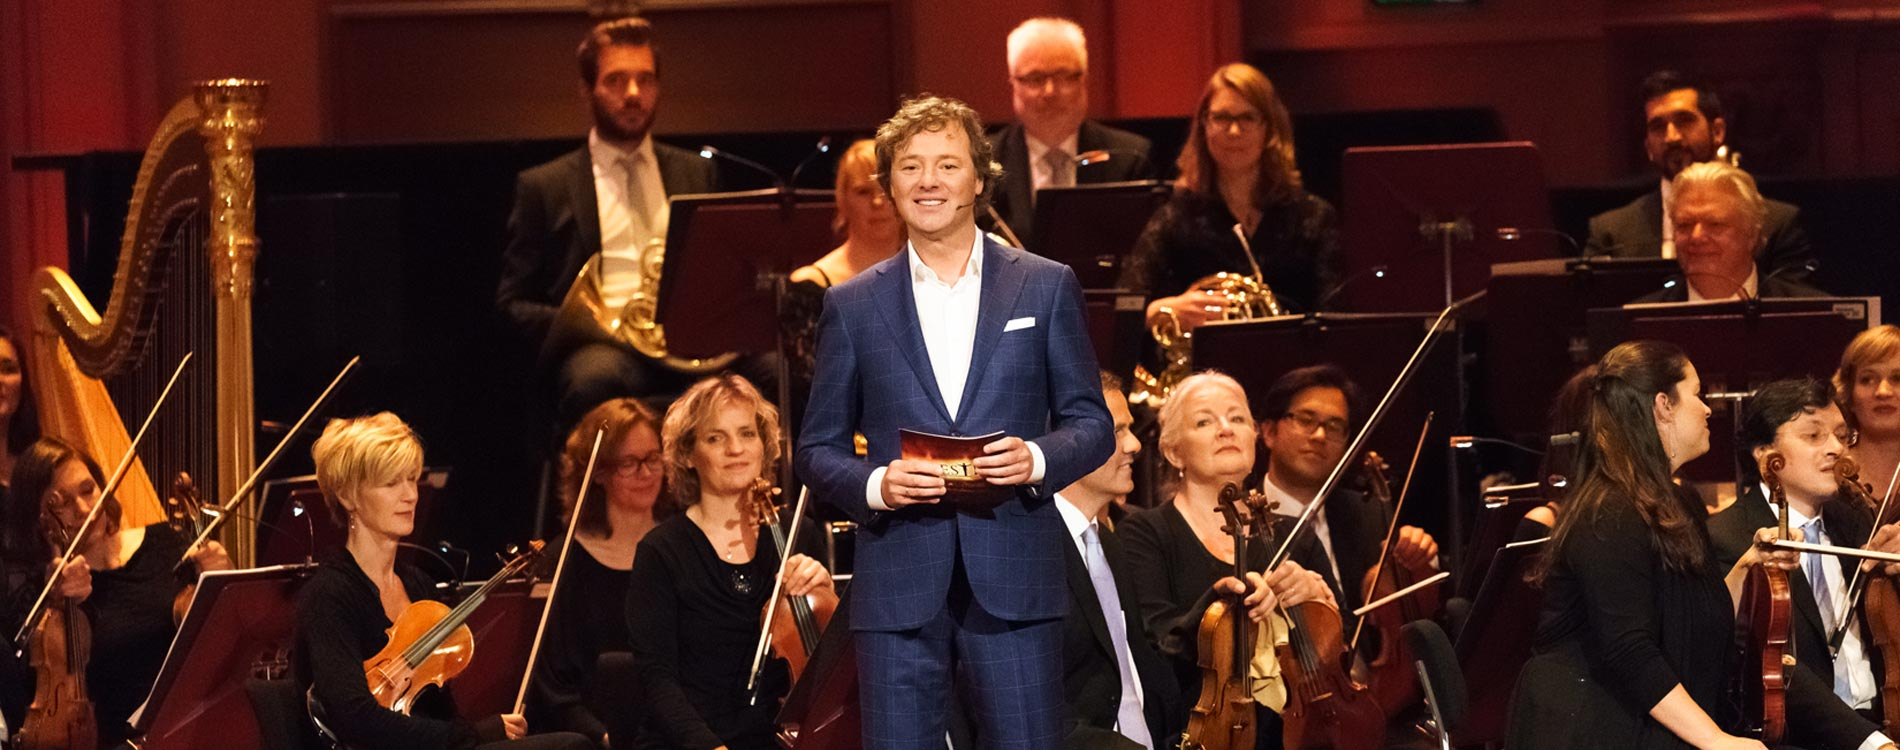 Biografie Frits Sissing Maestro televisie presentator